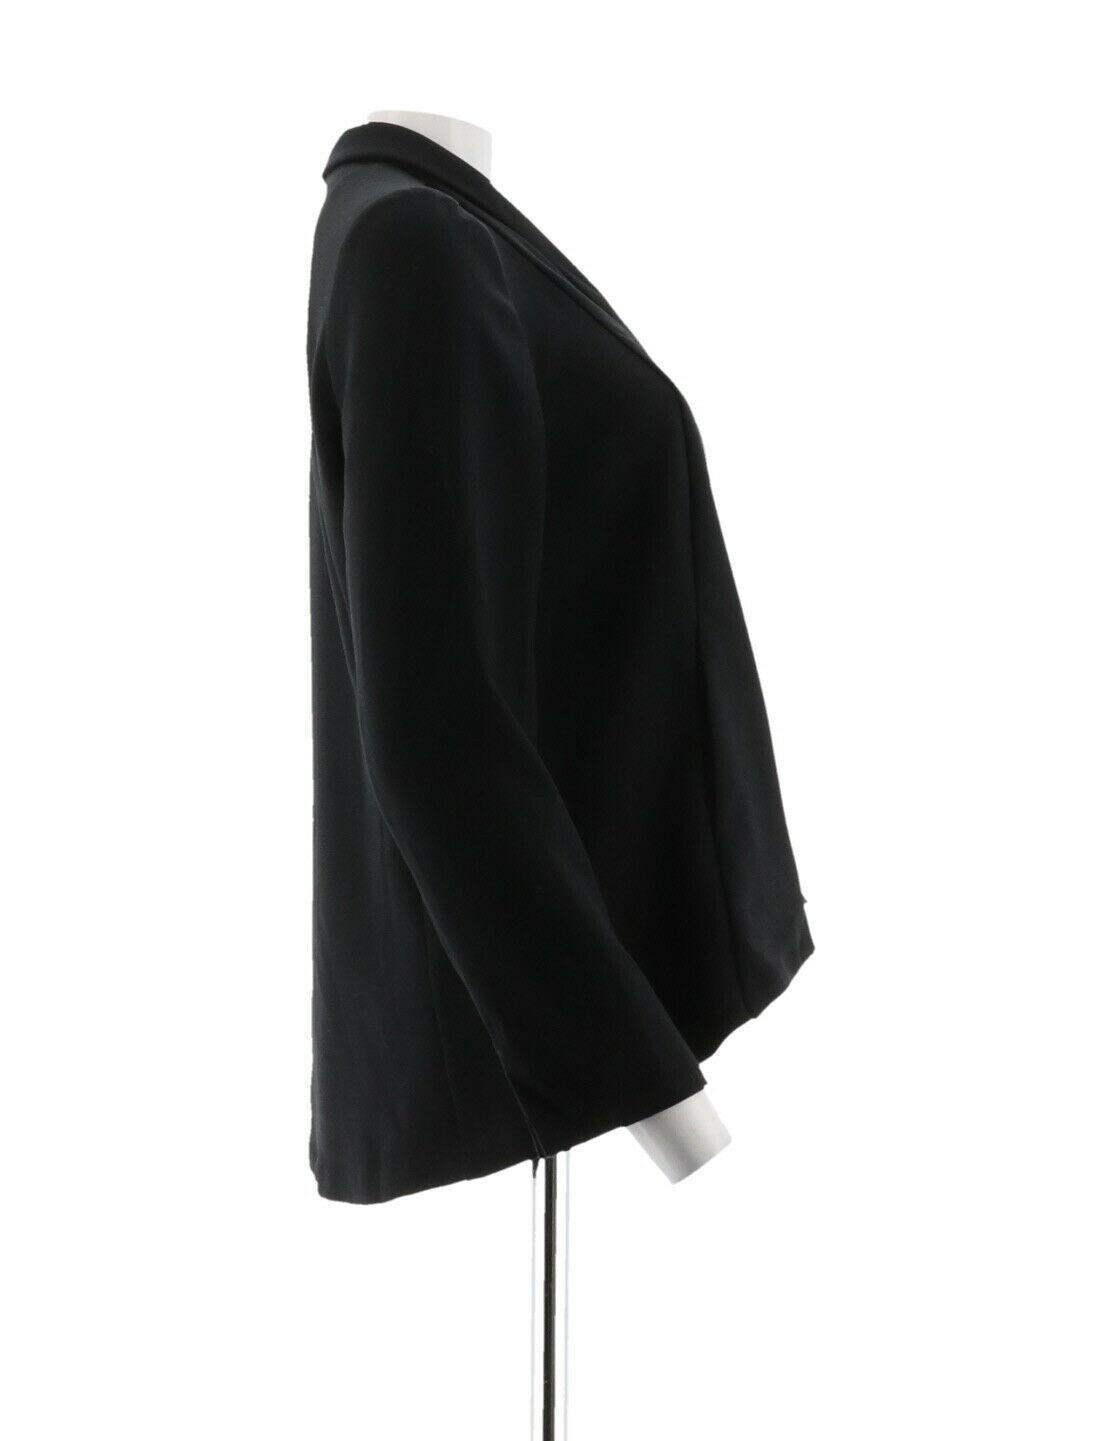 H Halston Long Slv Open Front Jacket Seam Black 12 NEW A303200 image 4